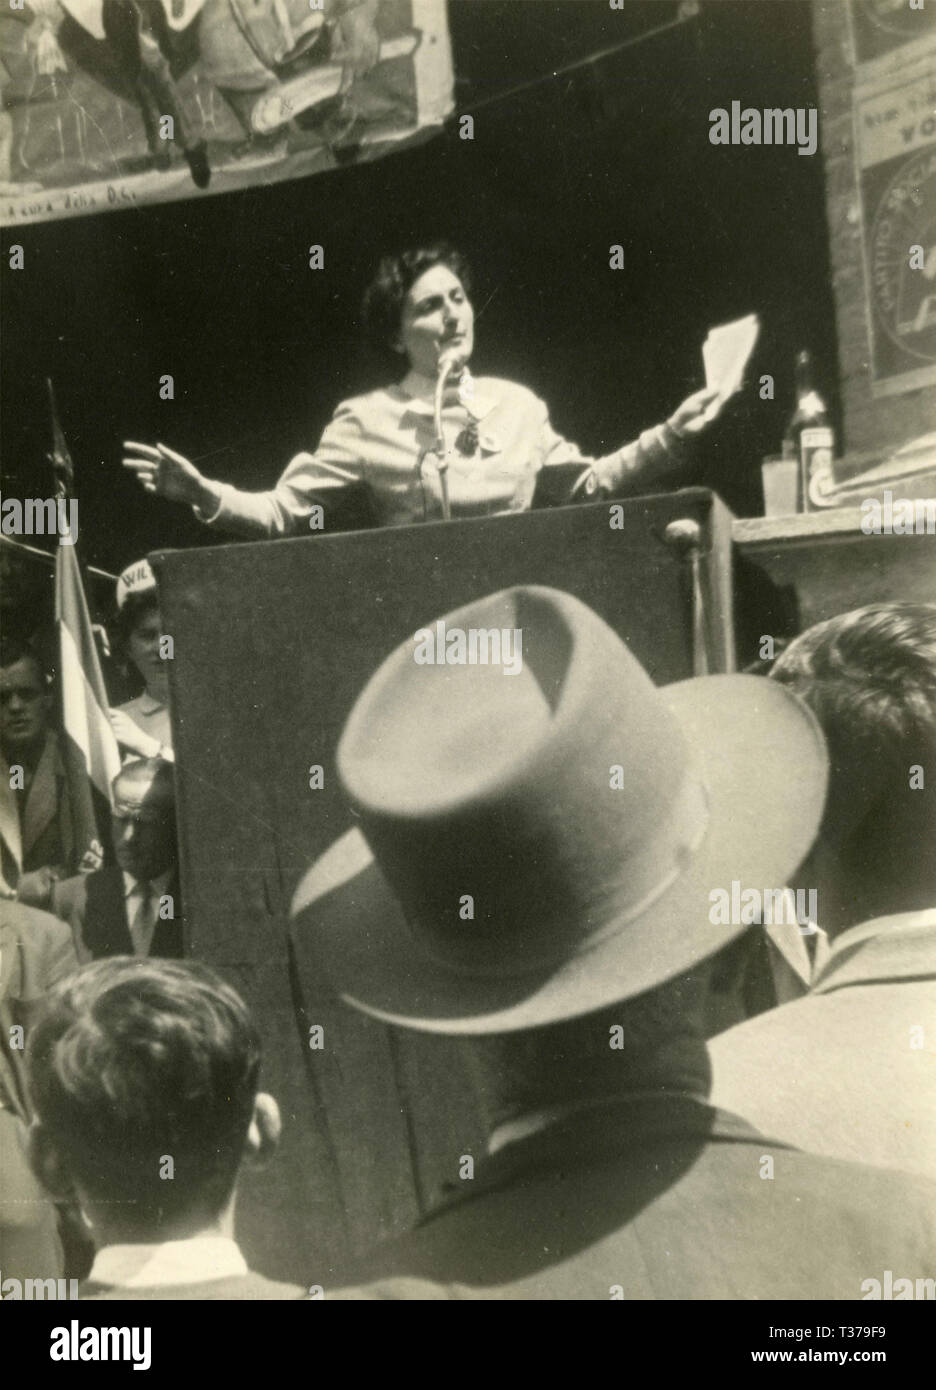 Mitin político por PCI Ilia Coppi, Montalcino, Italia, mayo de 1953 Imagen De Stock